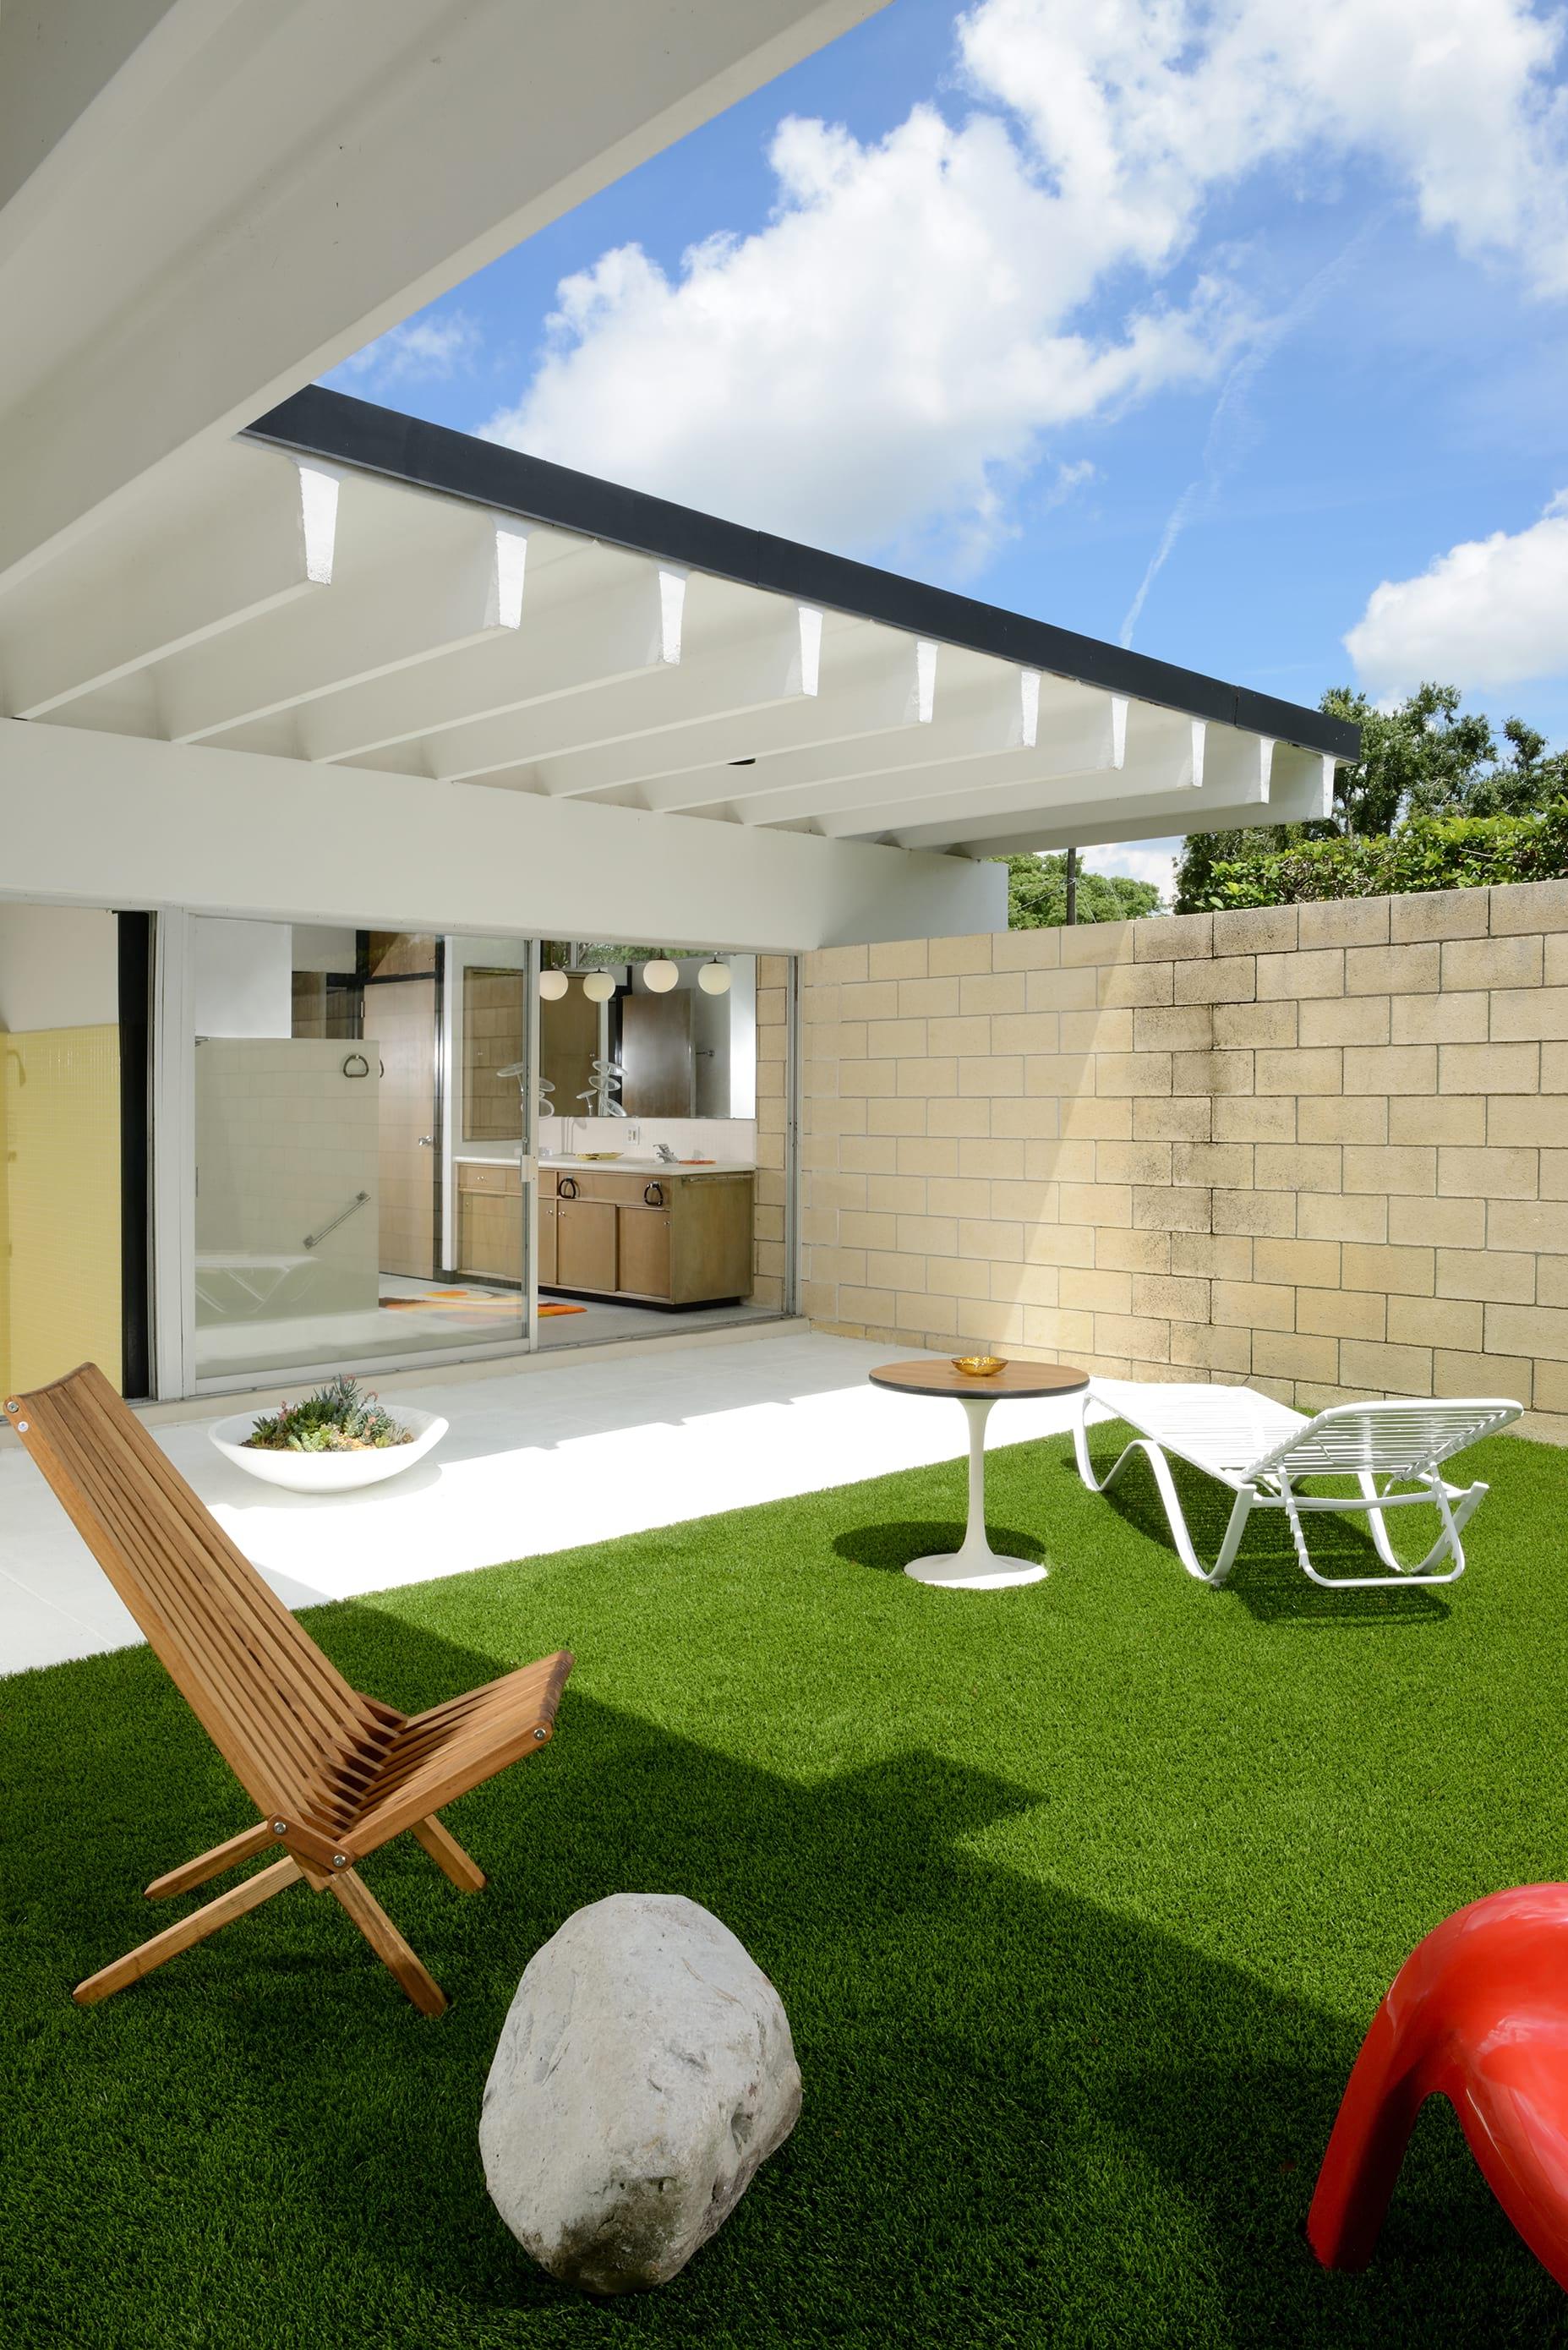 Christopher florentino - midcentury home Florida - garden